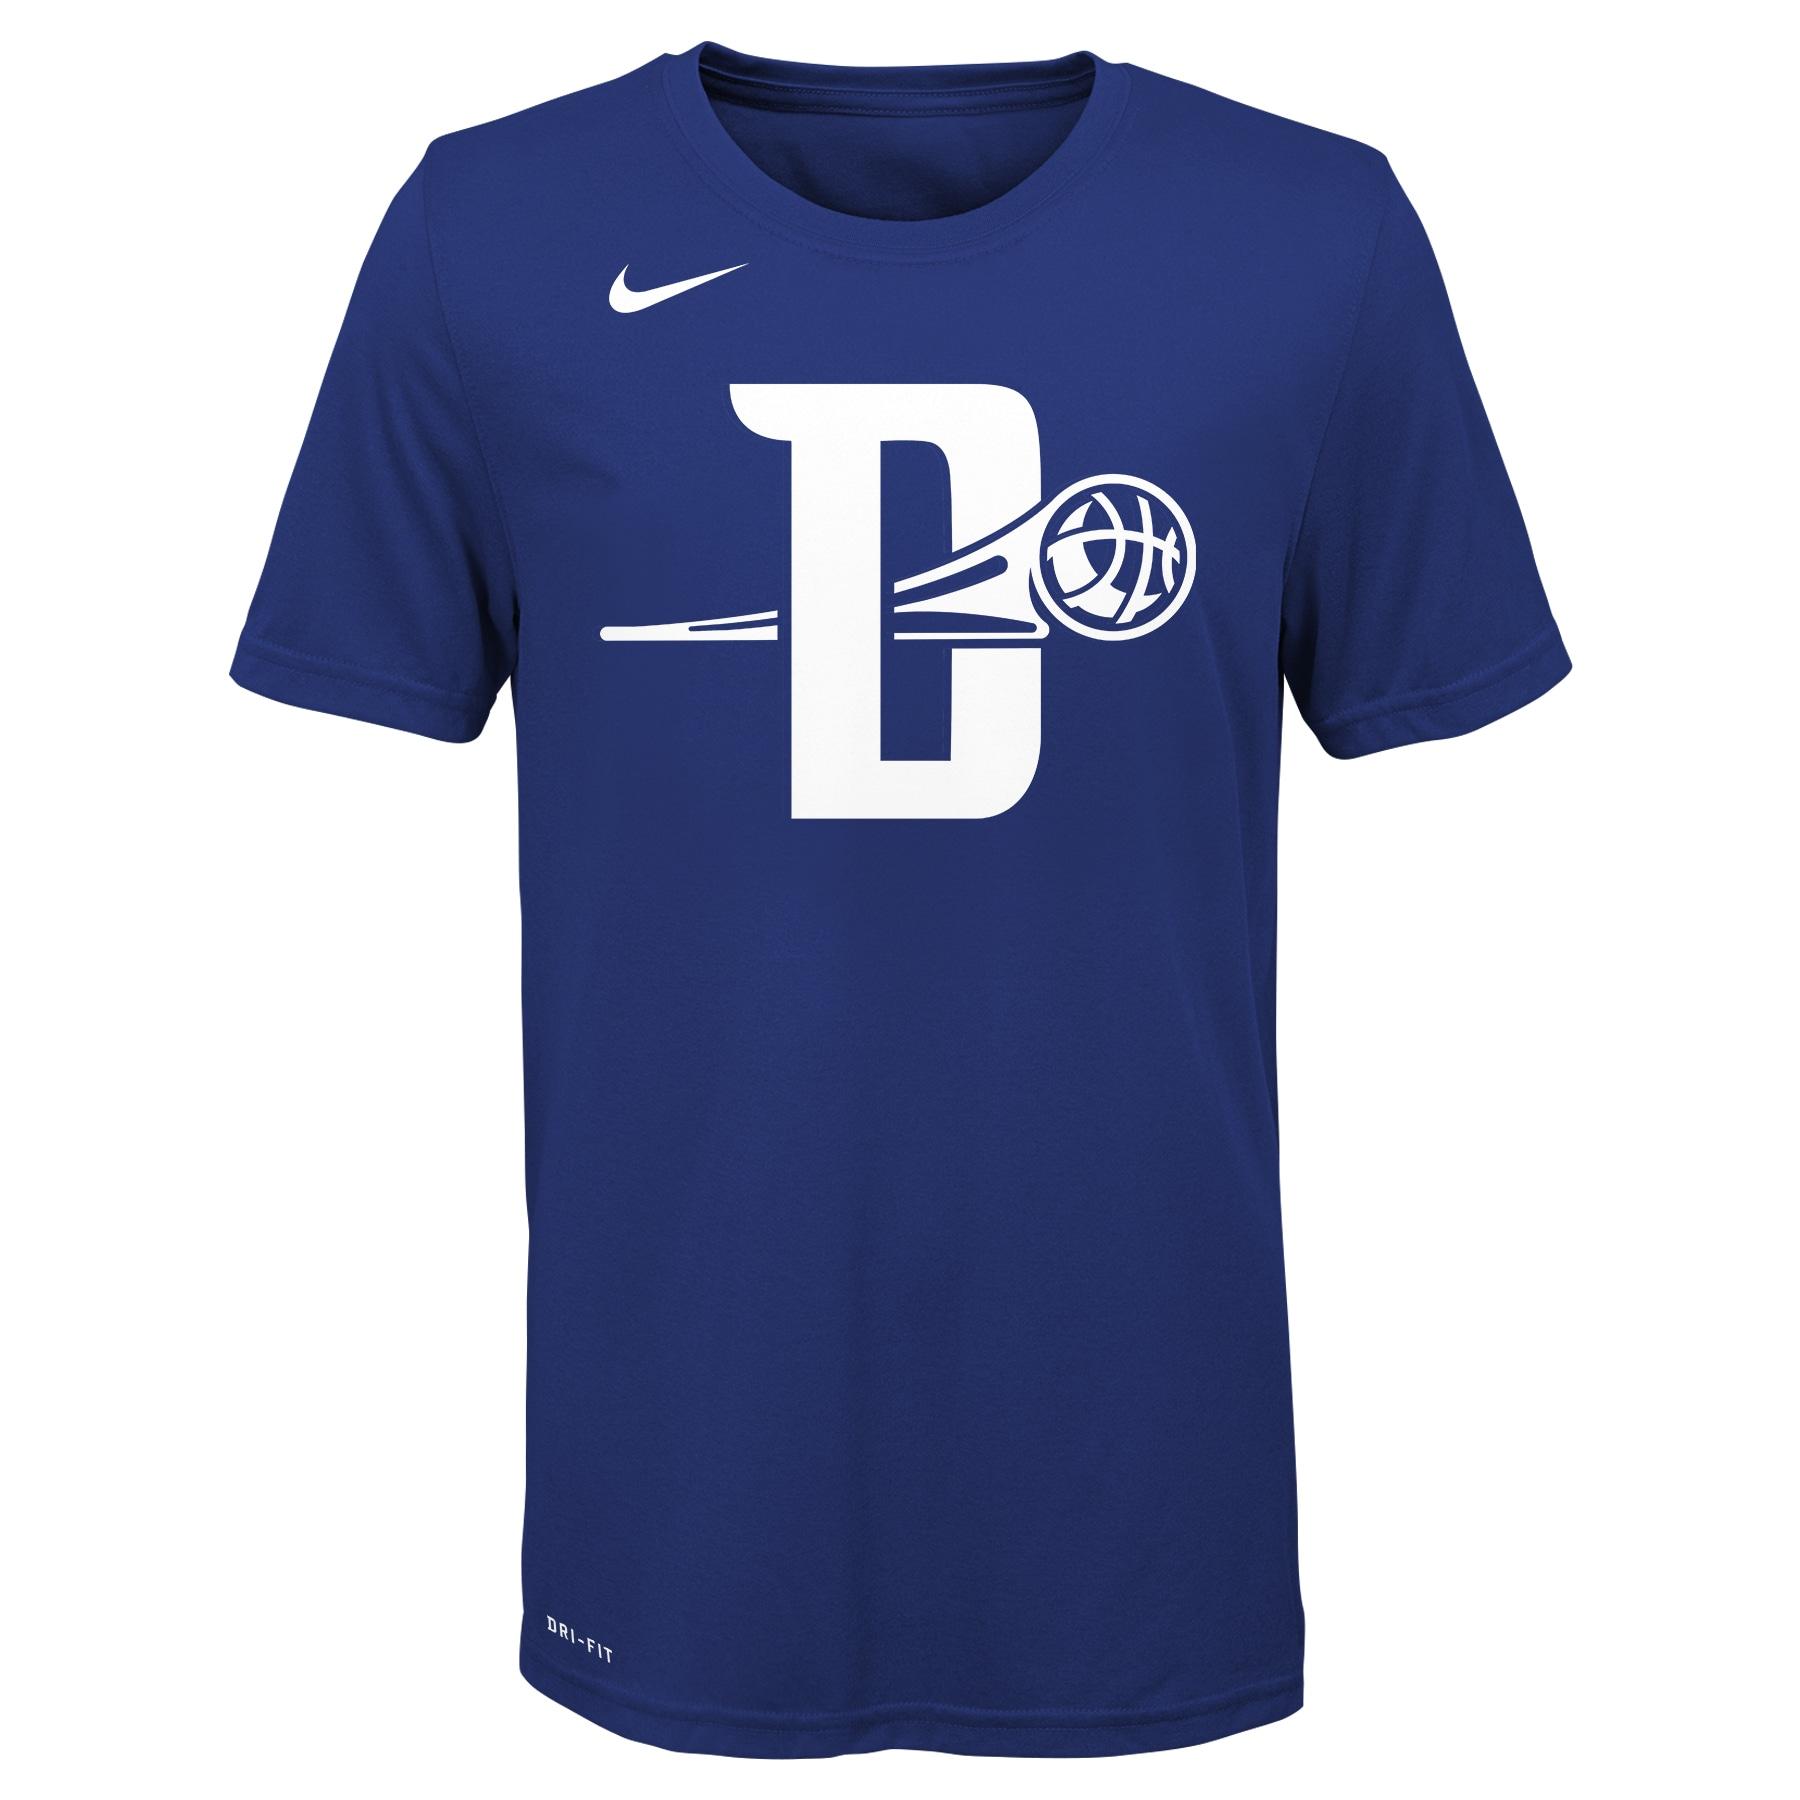 Detroit Pistons Nike Youth 2019/20 City Edition Logo T-Shirt - Blue